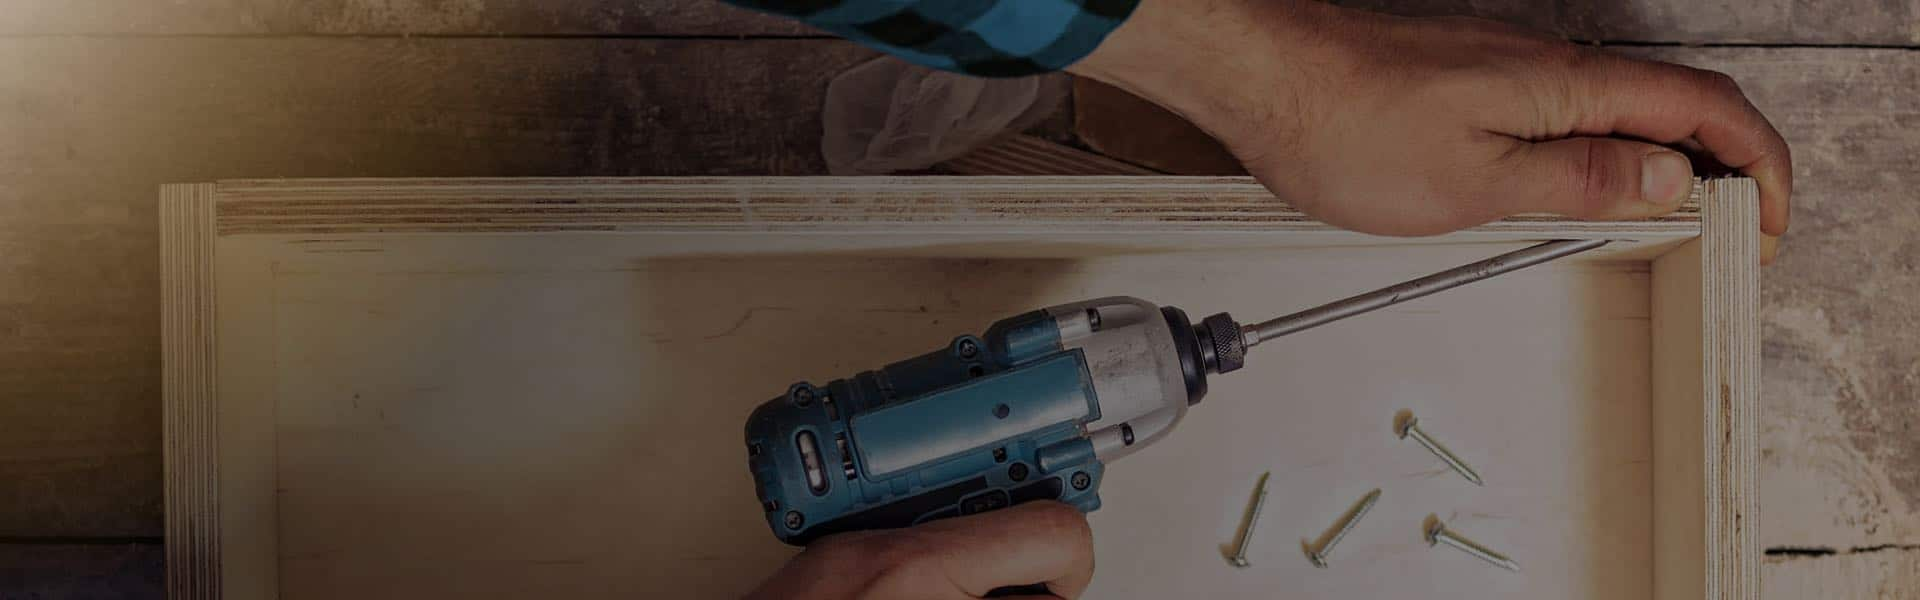 General Contractor Insurance